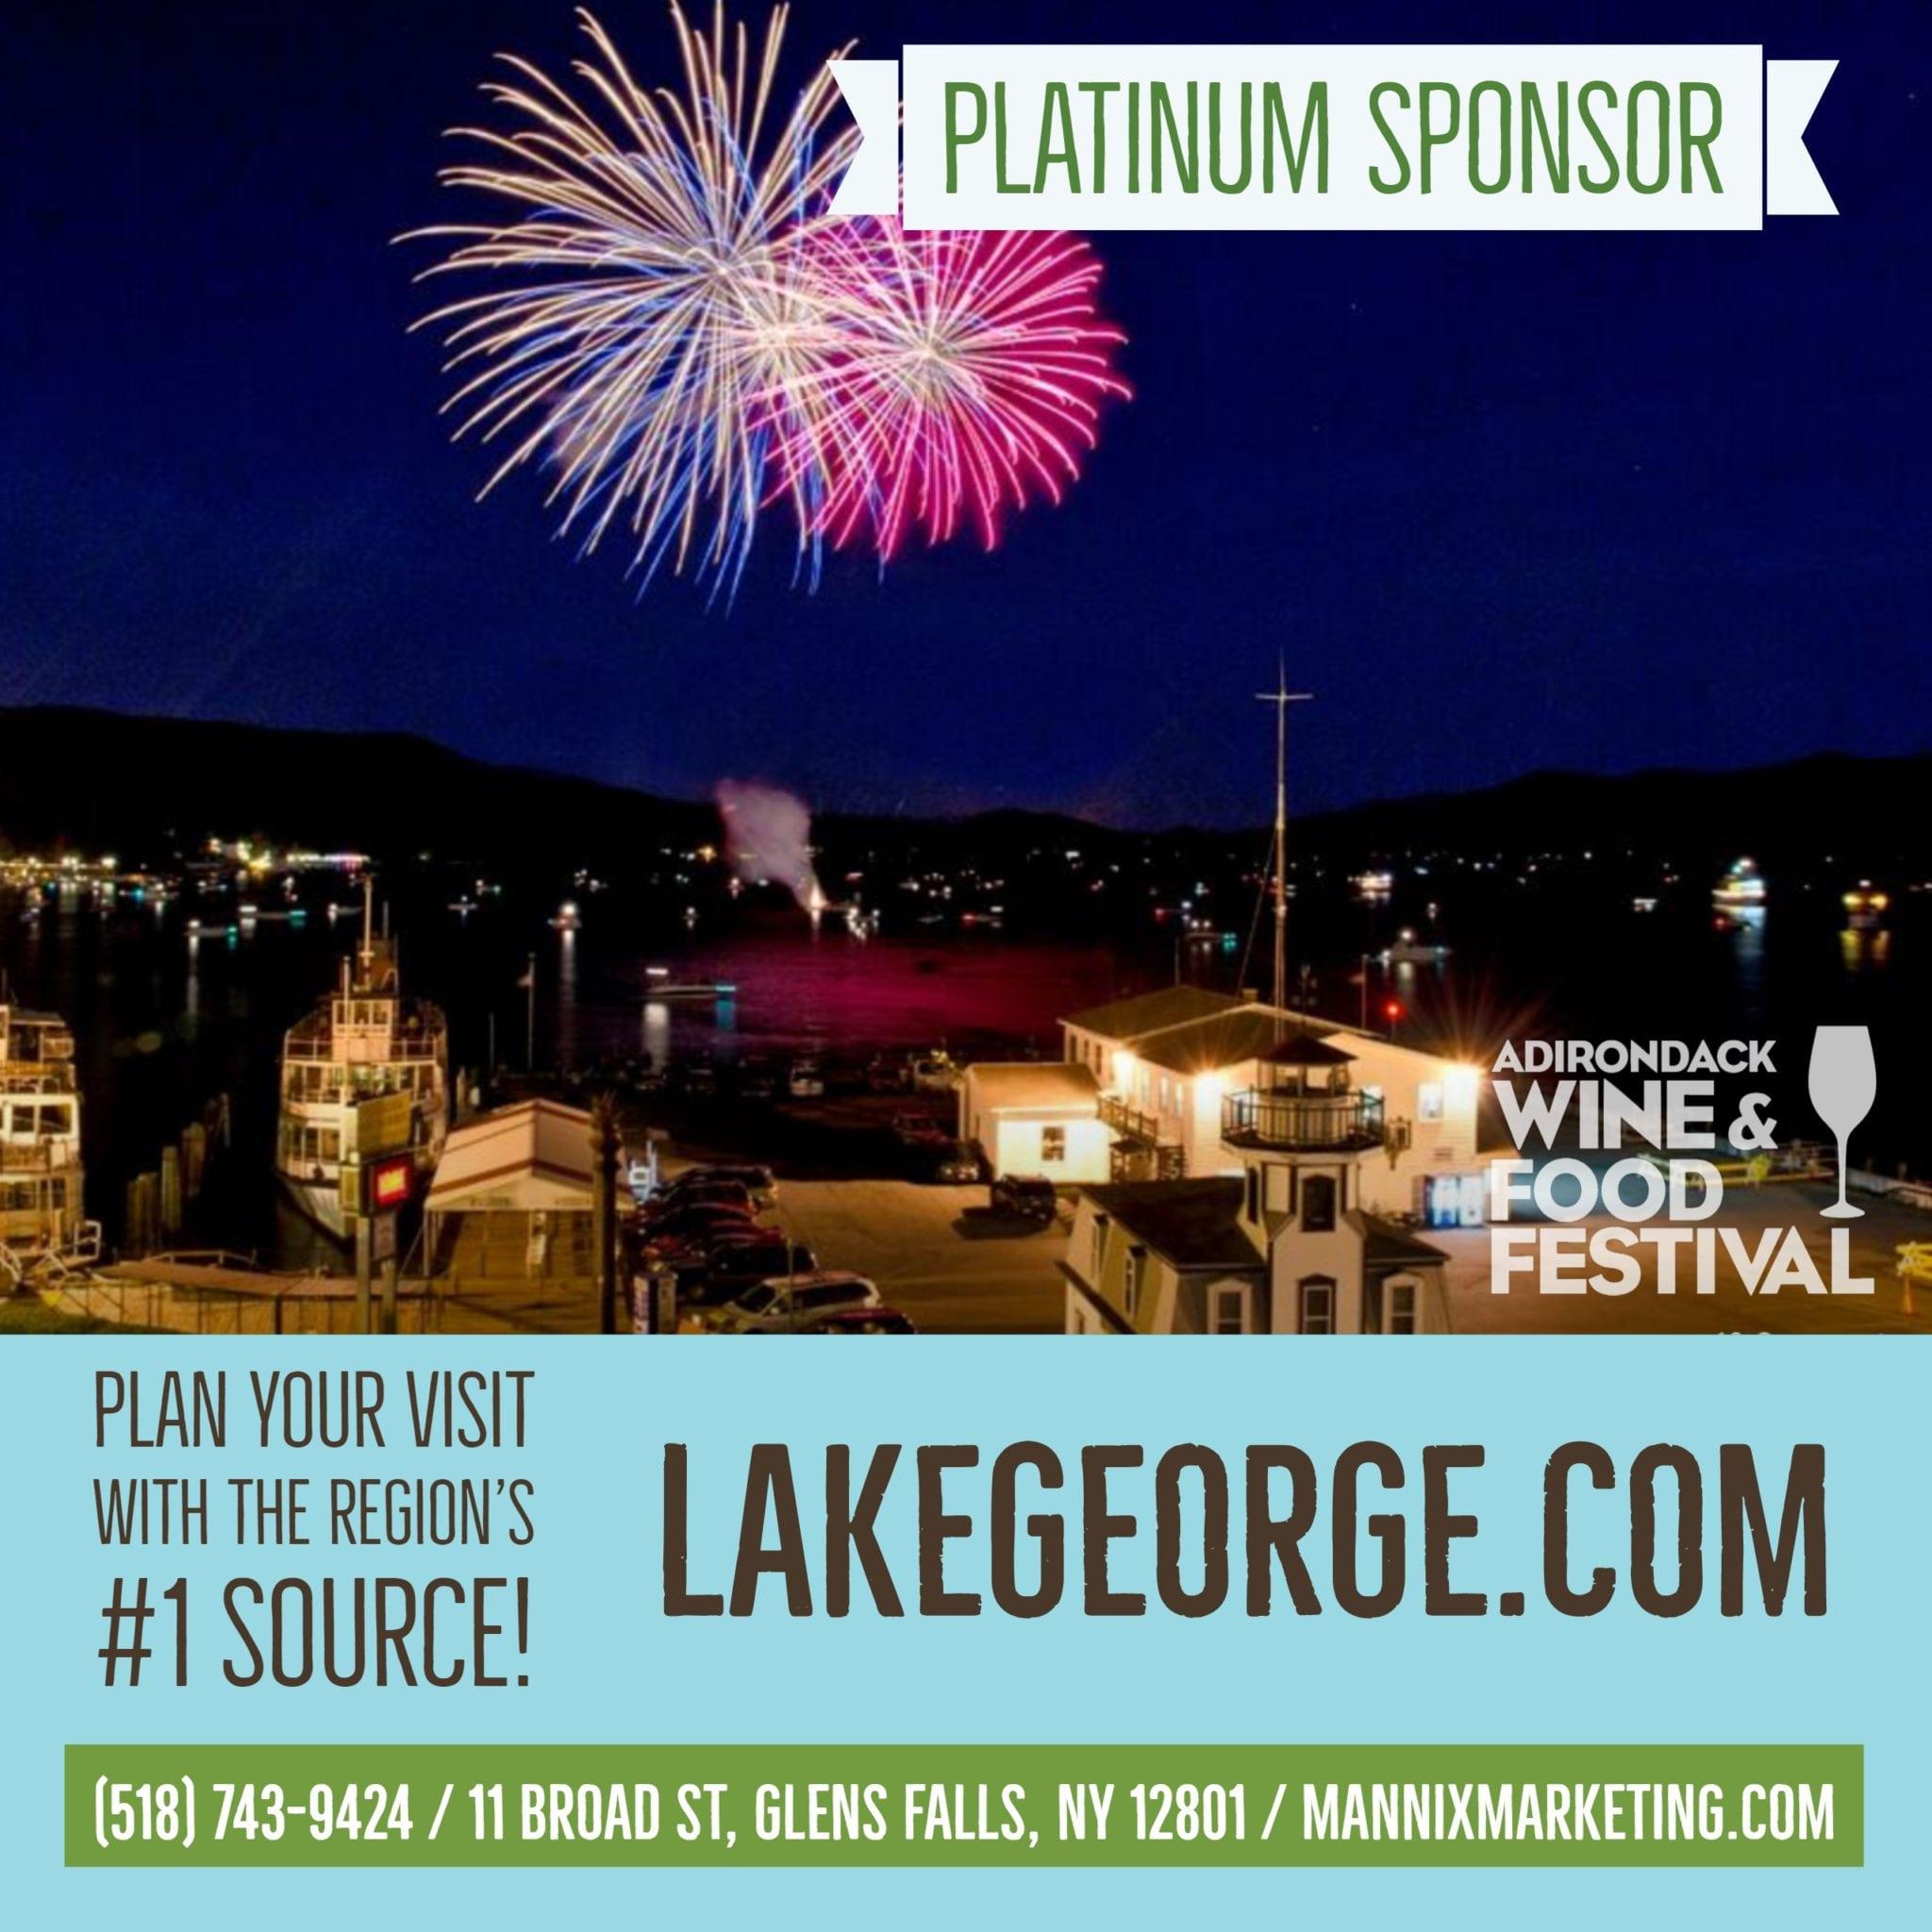 Lakegeorge.com